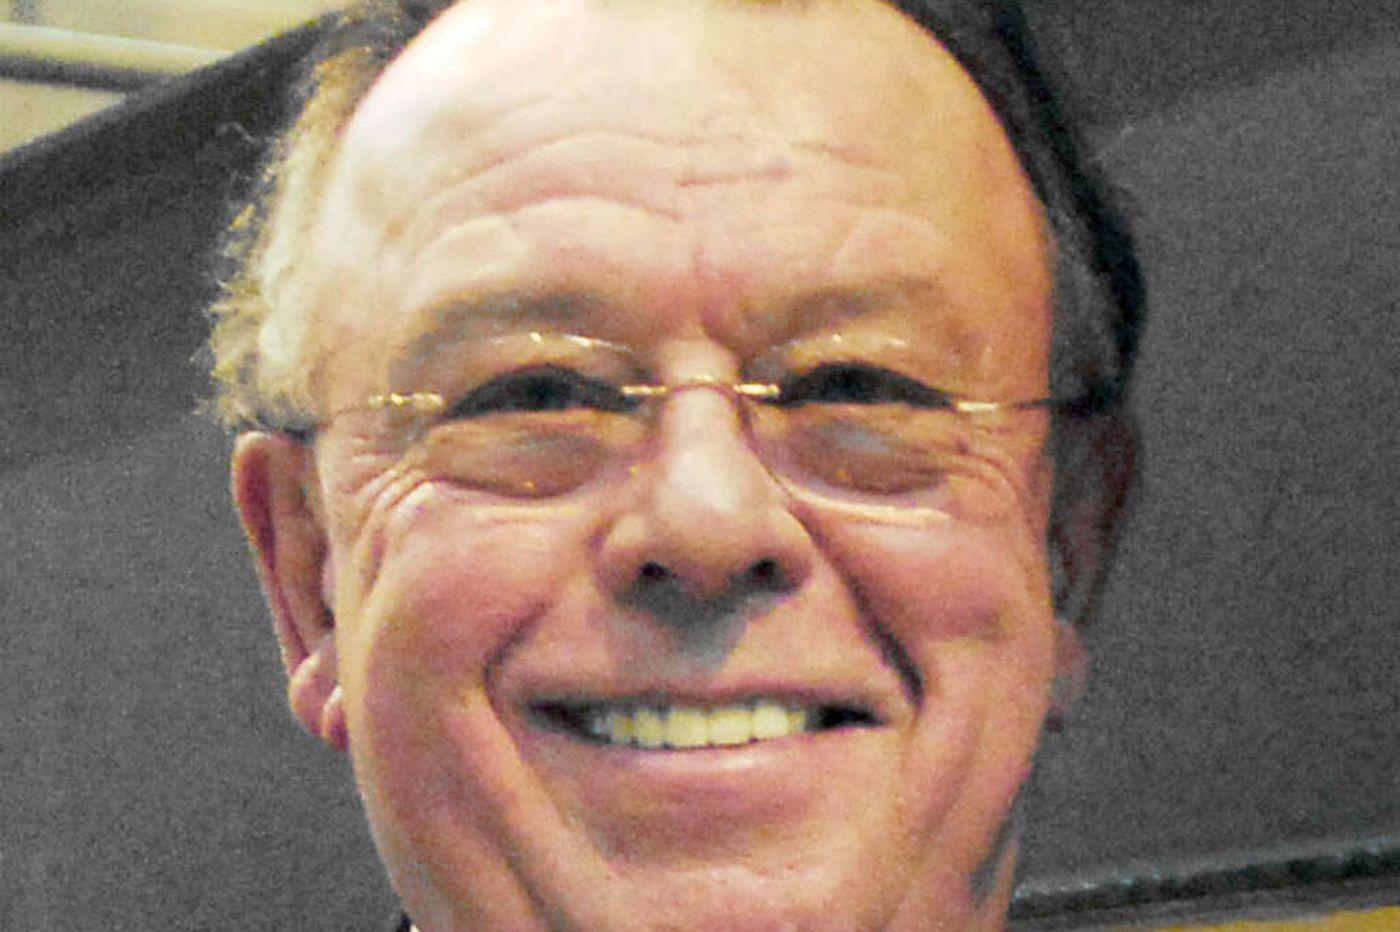 Feds: Ironworkers union was like 'the mafia' under Dougherty